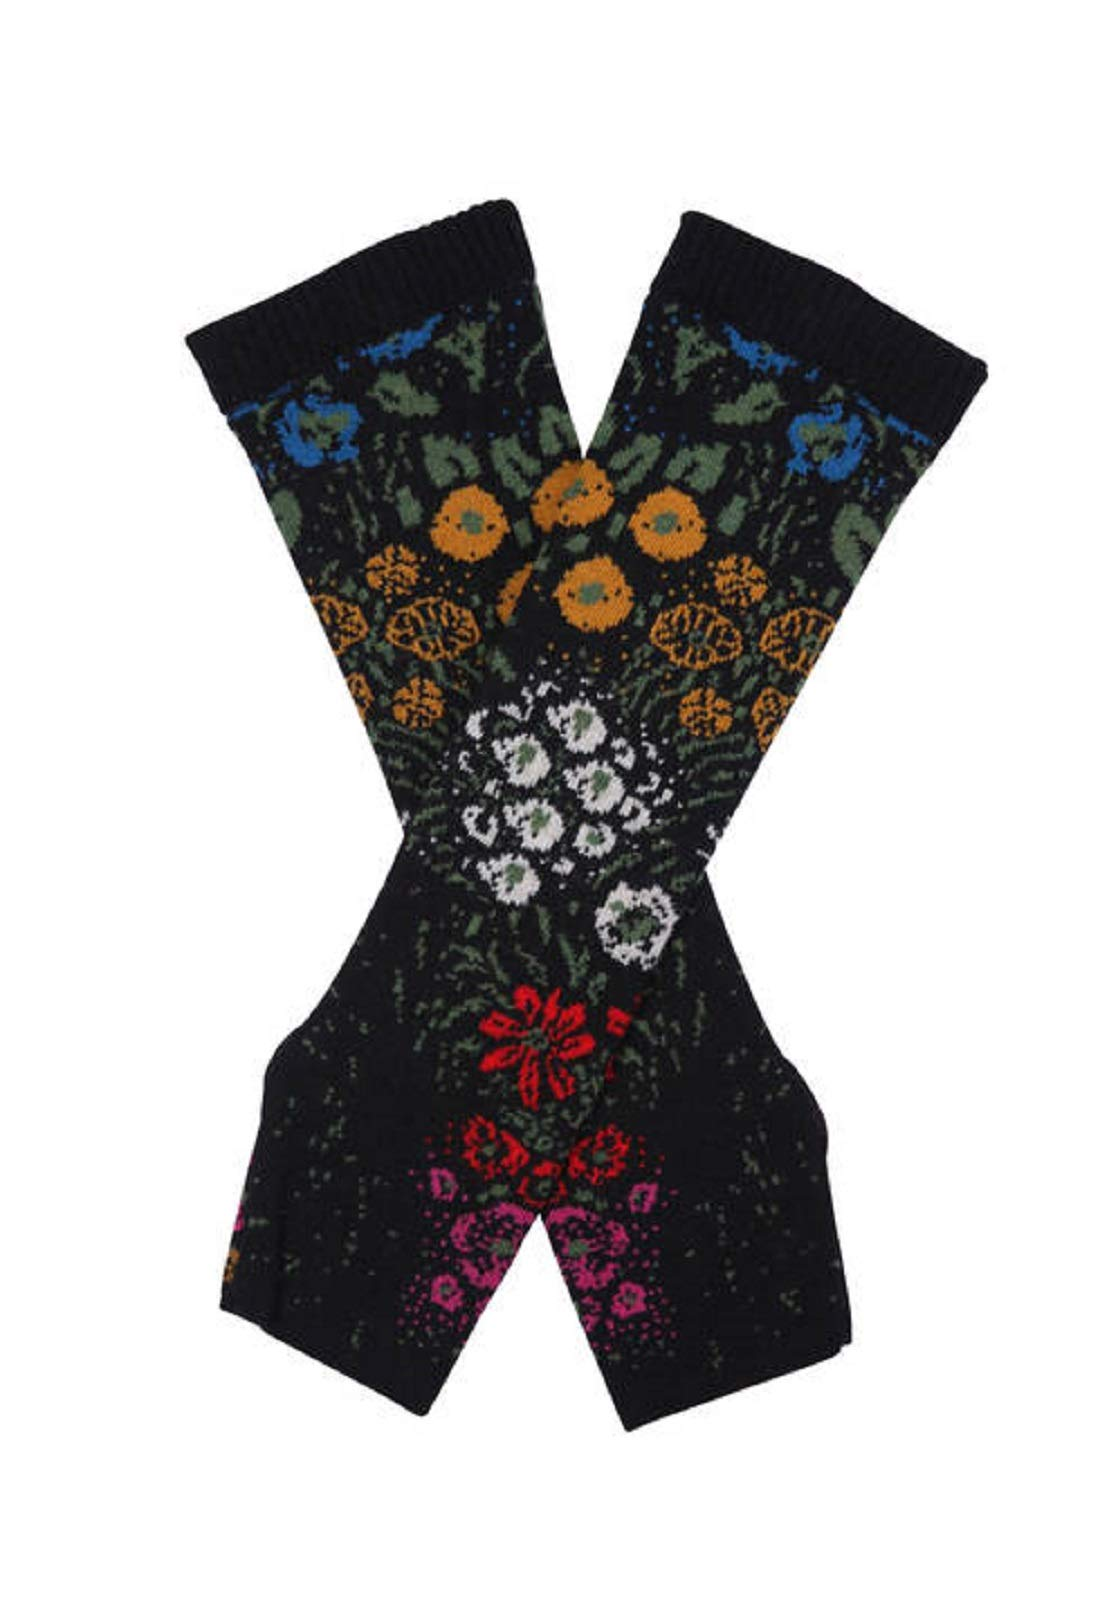 IVKO Impression Collection Floral Pattern Wrist Warmers in Black Fine Merino Wool Gloves Pullwarmers by IVKO